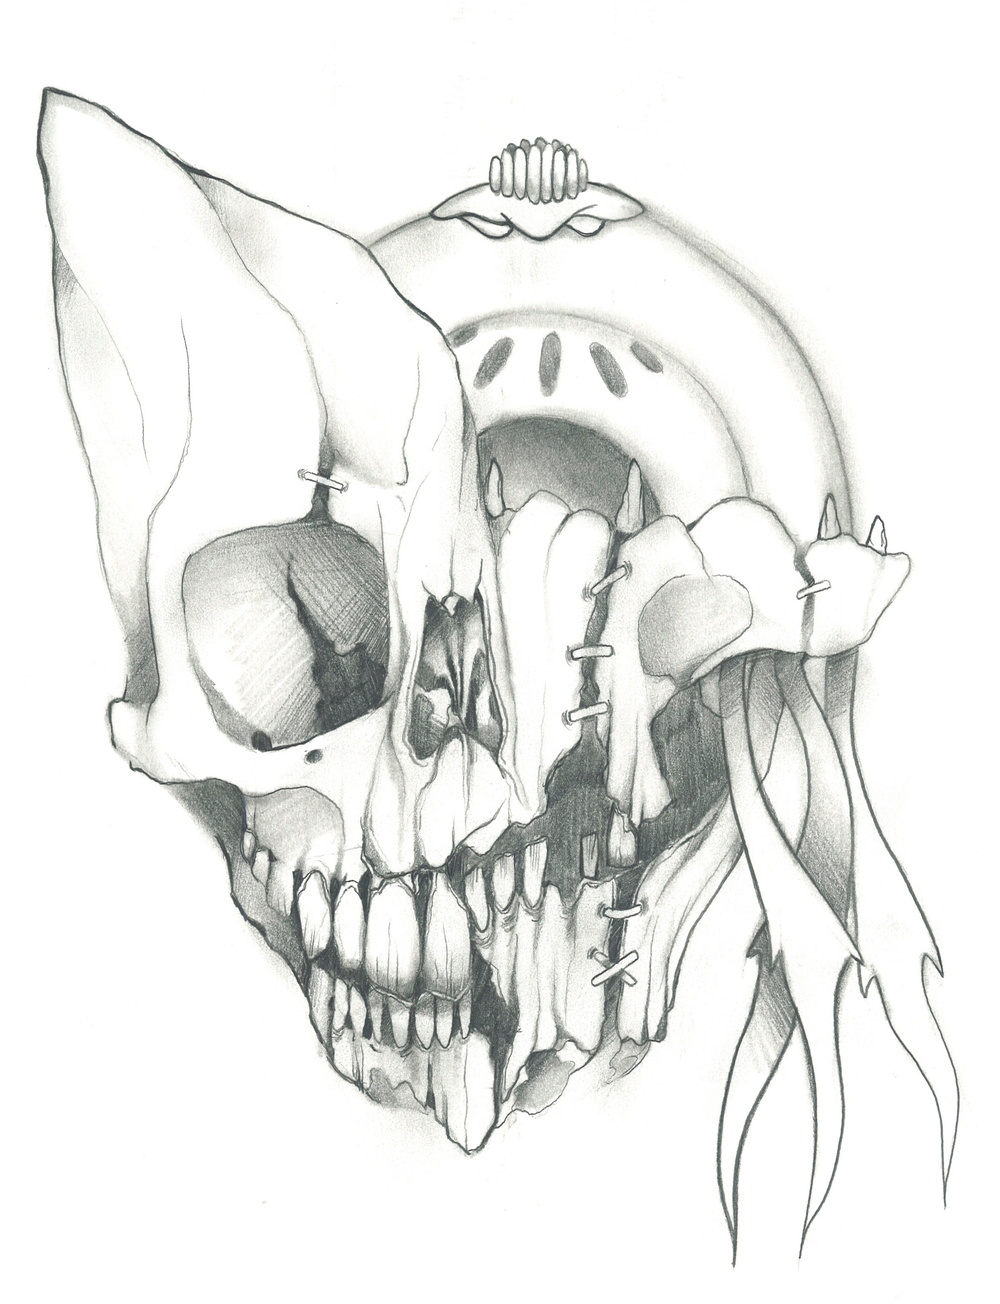 Sketch Study 1